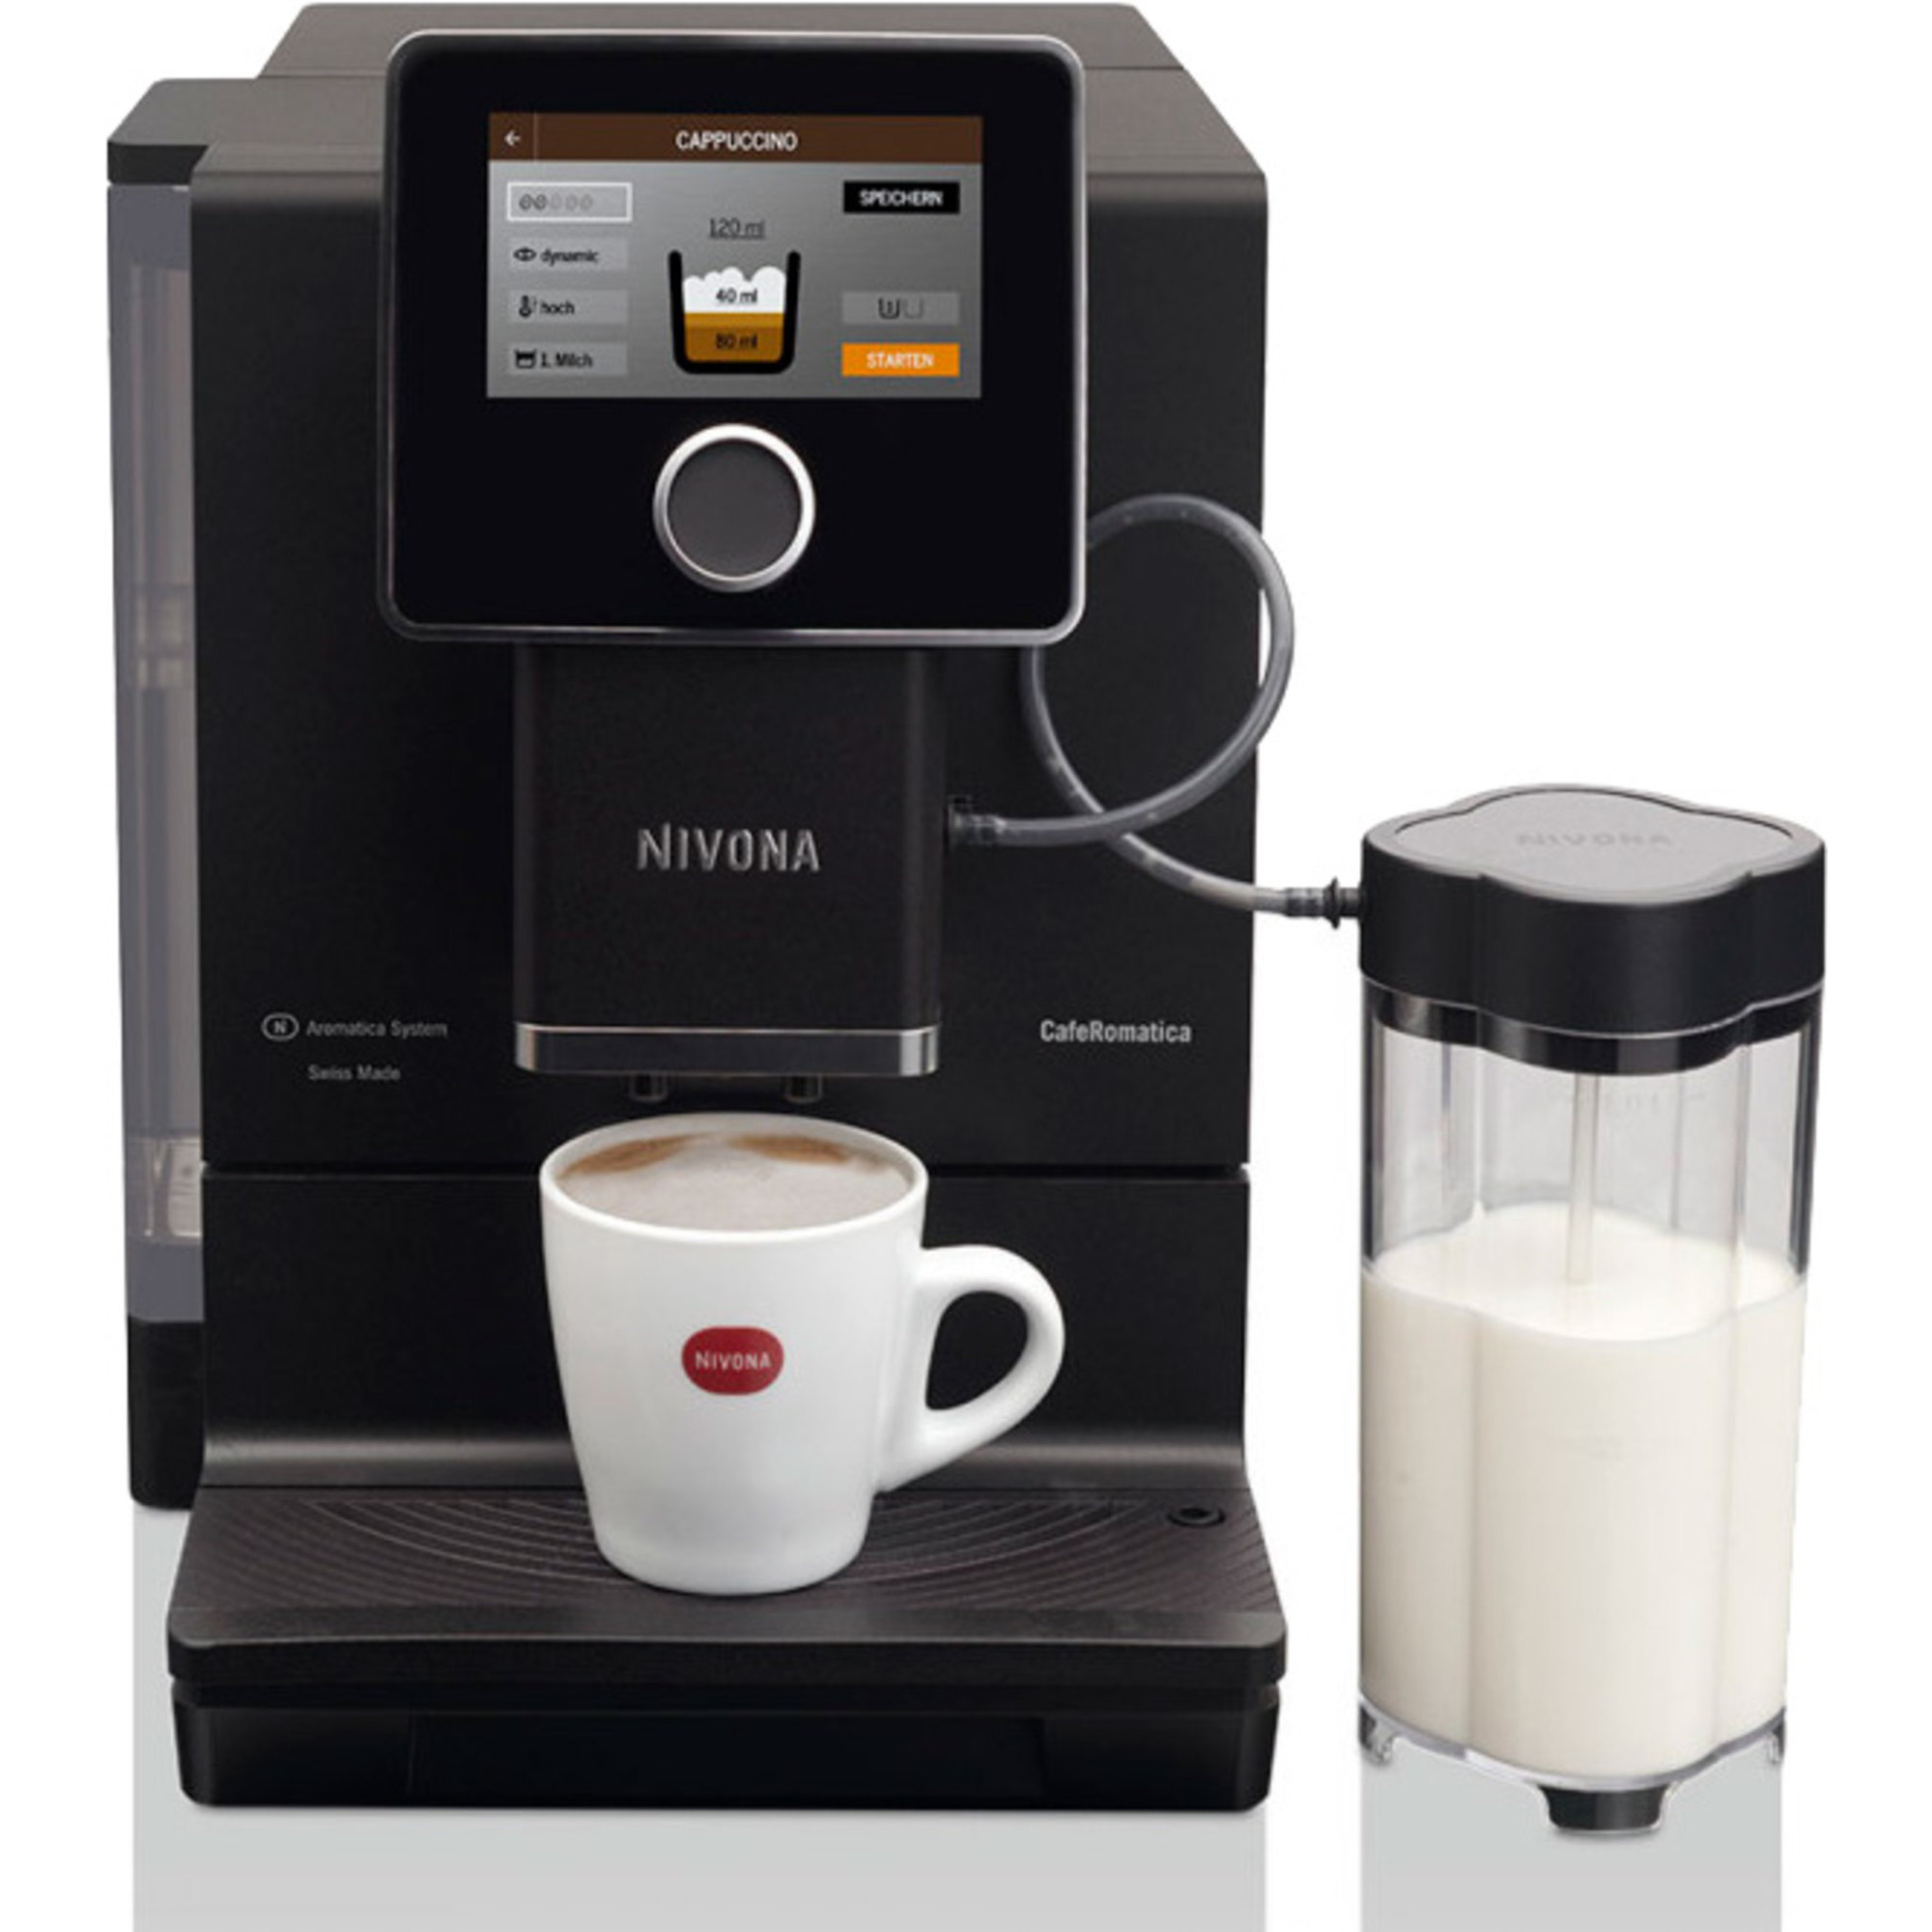 Nivona Kaffemaskin Svart matt 5 touch display NICR 960